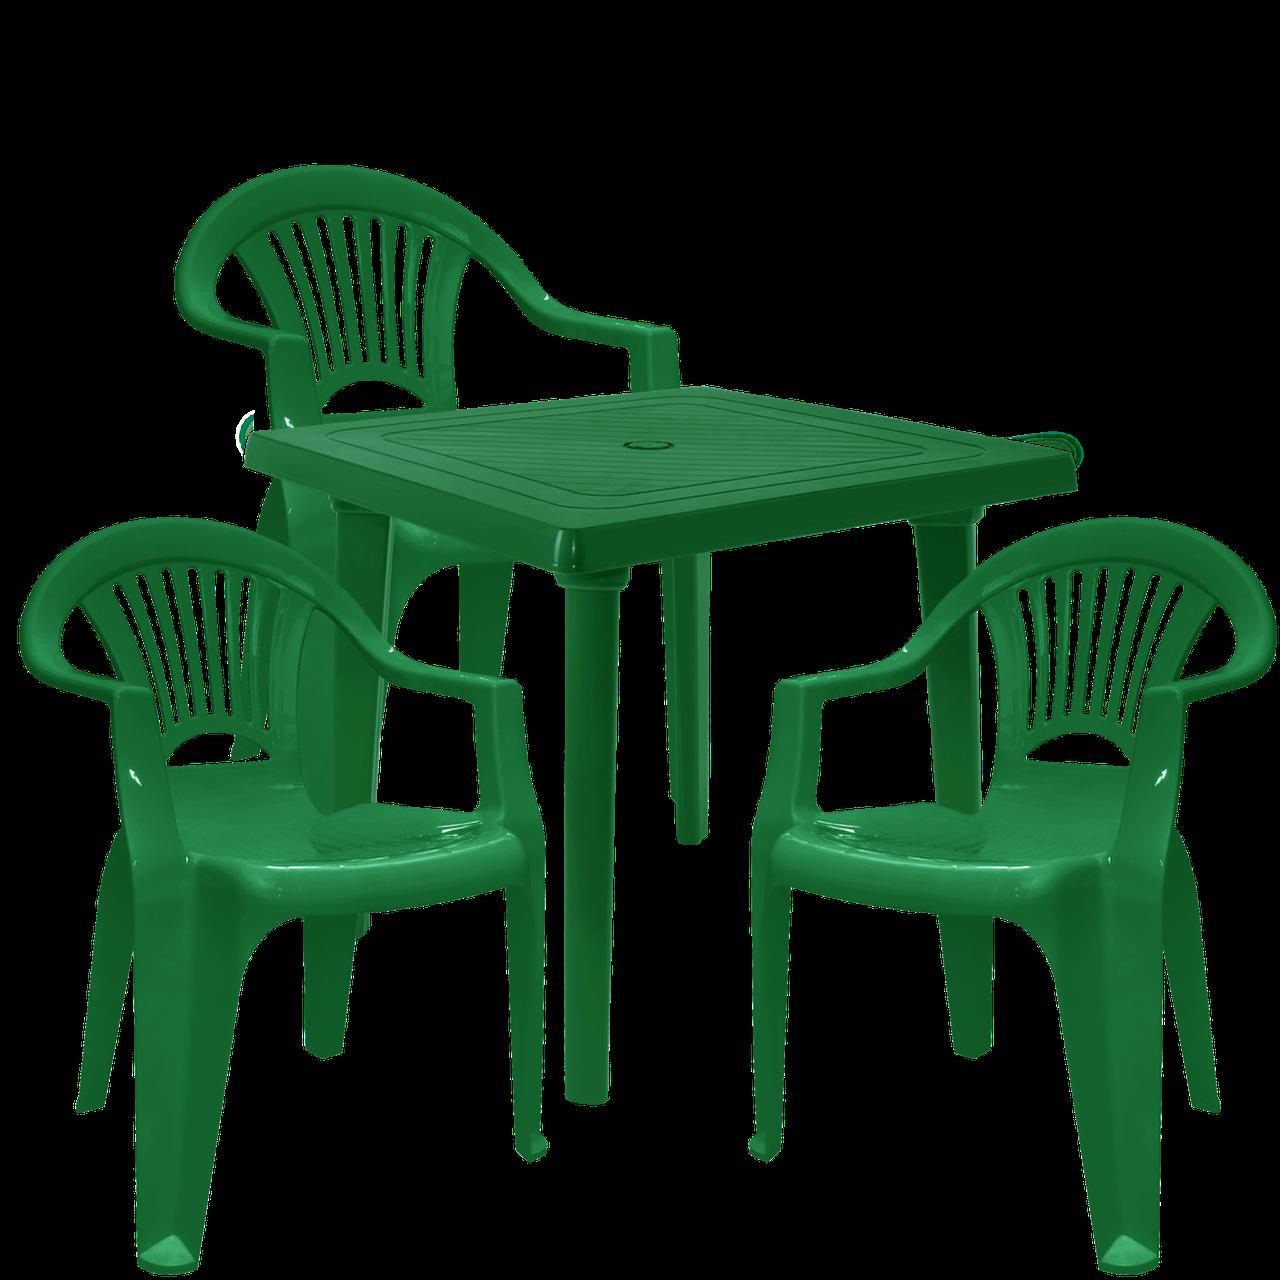 Стол и стулья Зеленый (ЛУКВАД 3z)